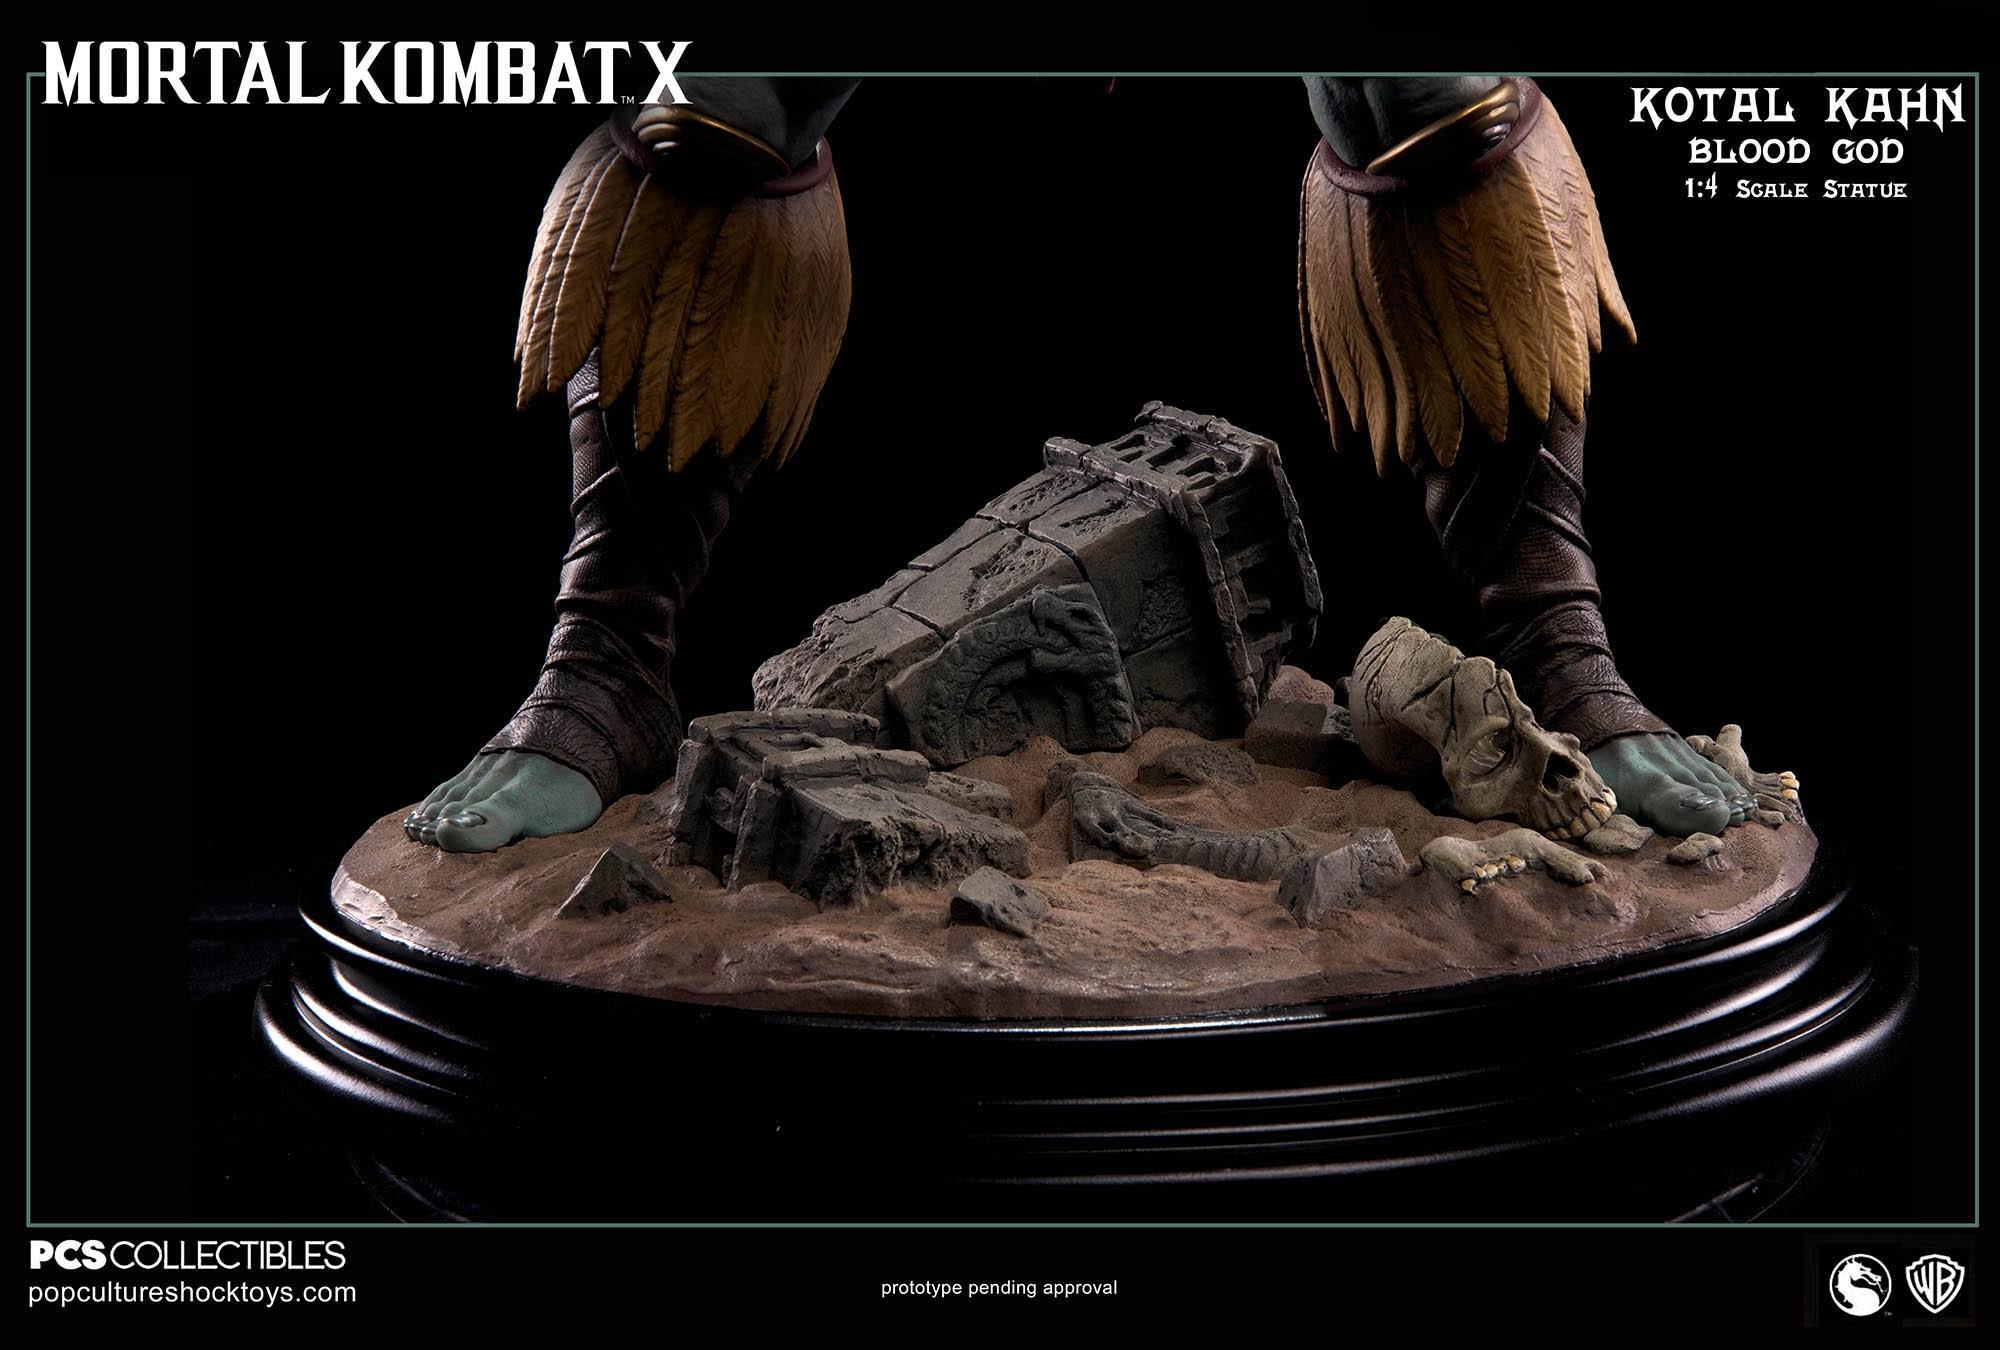 [Pop Culture Shock] Mortal Kombat X: Kotal Kahn 1:4 scale PCS-Kotal-Kahn-Blood-God-019